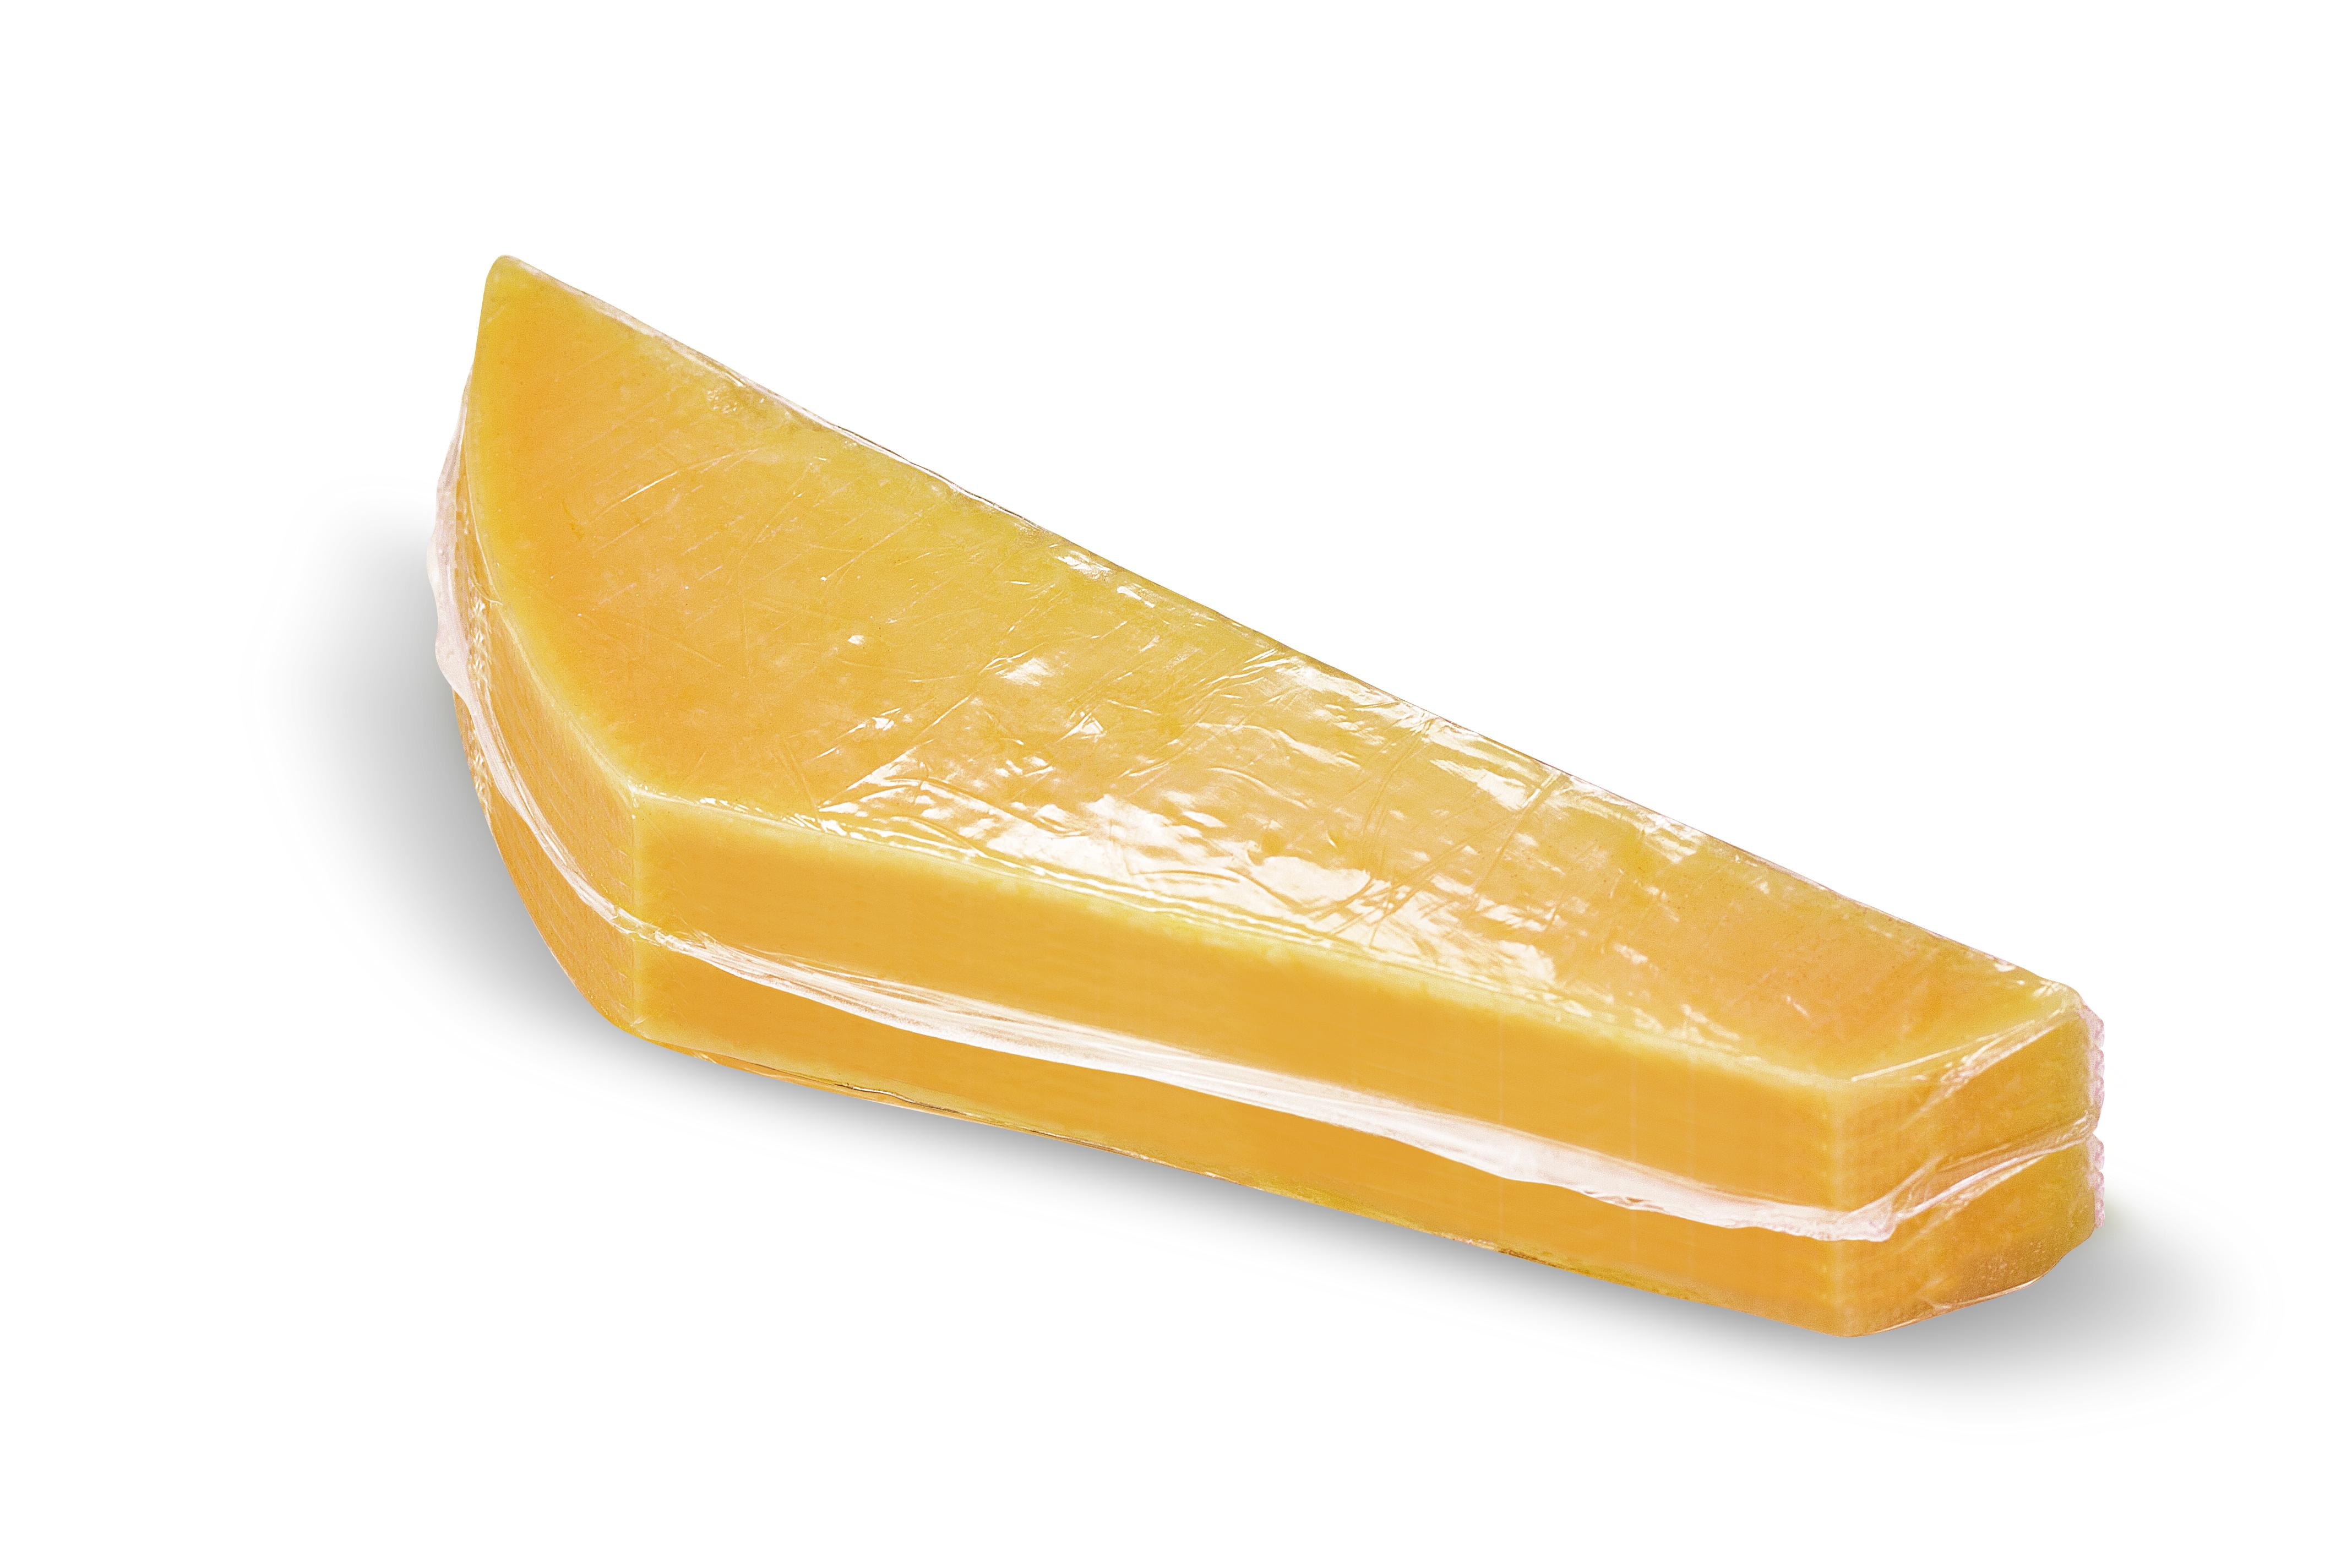 Im Schrumpfbeutel verpackter Käse